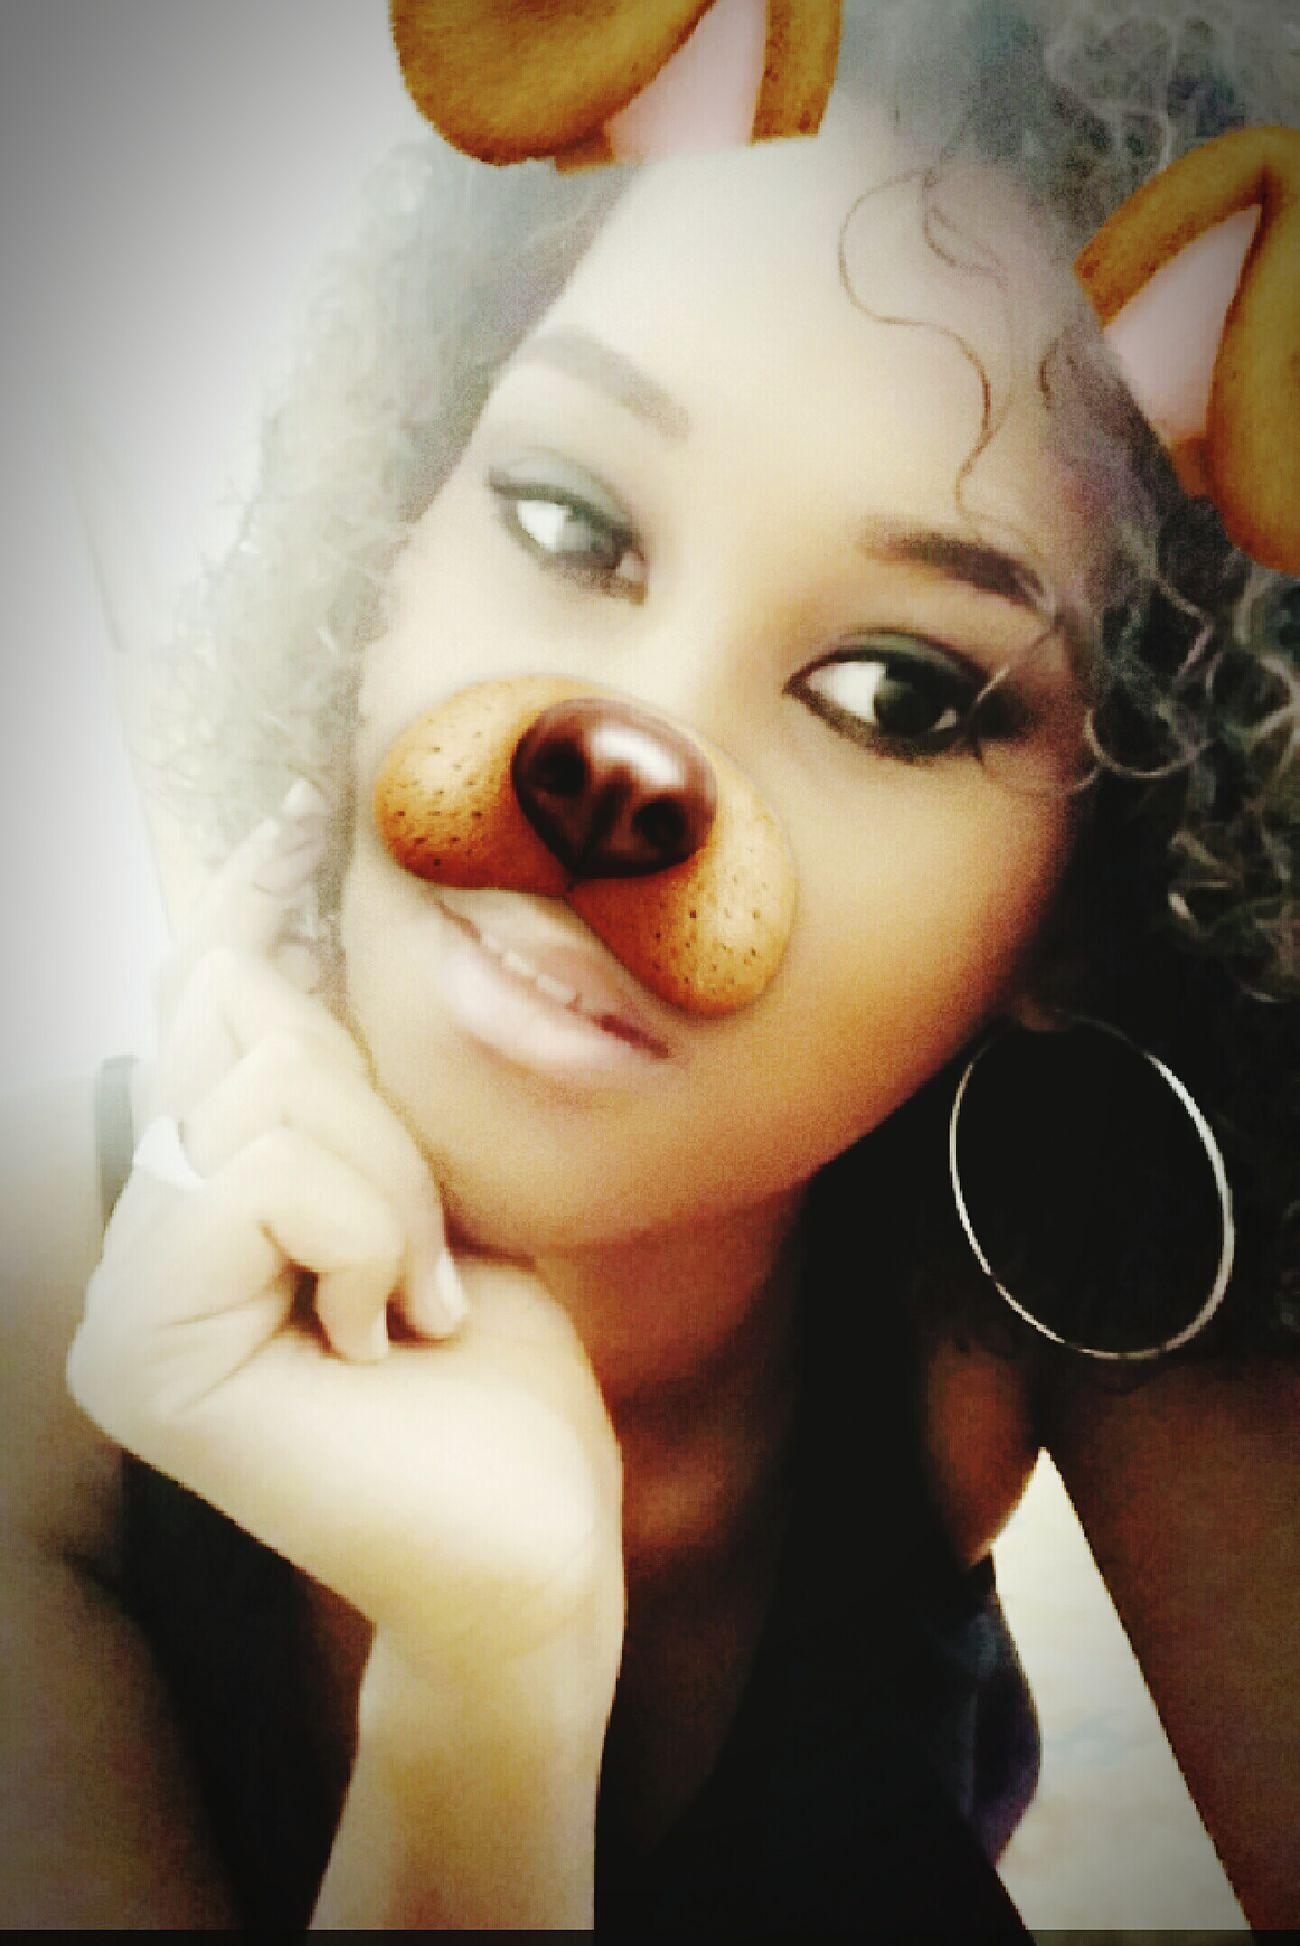 Relaxing Happy Beauty Curly Hair Enjoy ✌ Blackgirl Selfie Makeup Smokey Eyes Followme That's Me Snapchat Selfie ✌ Blackandwhite